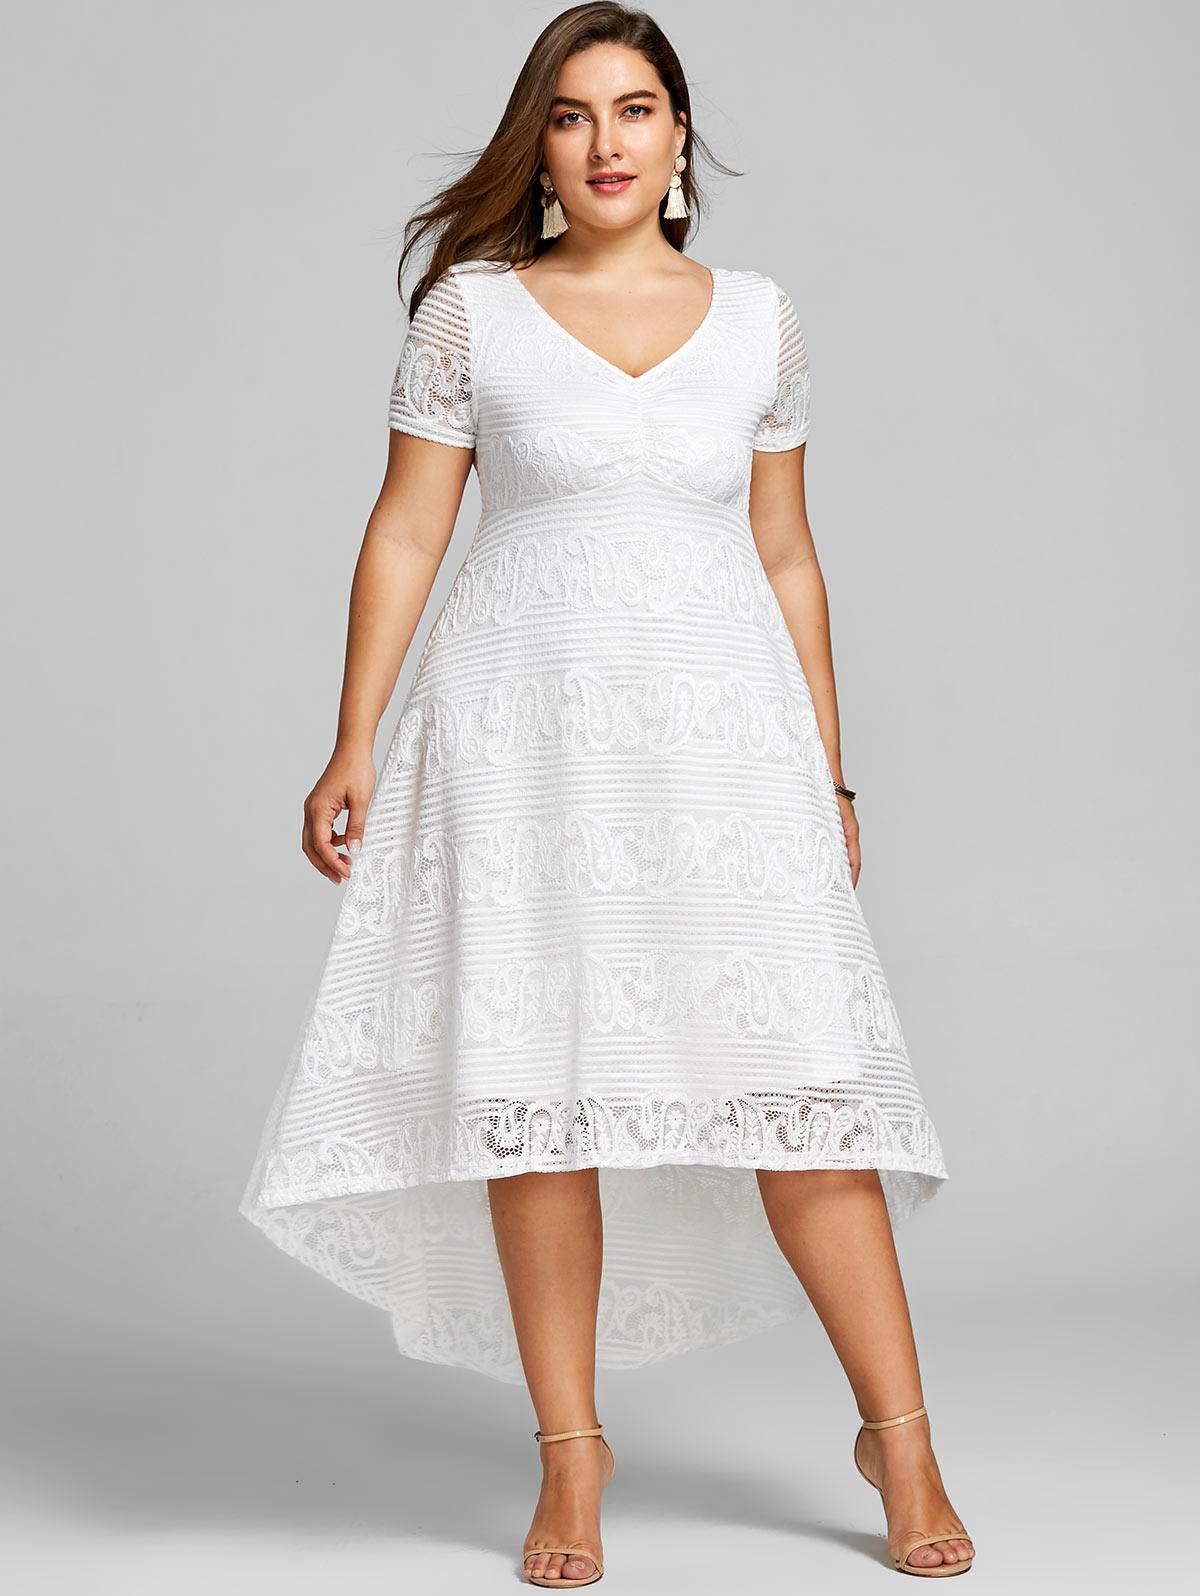 33210e6dc966b 2019 Gamiss Plus Size 5XL High Low Midi Dress Women Short Sleeves ...